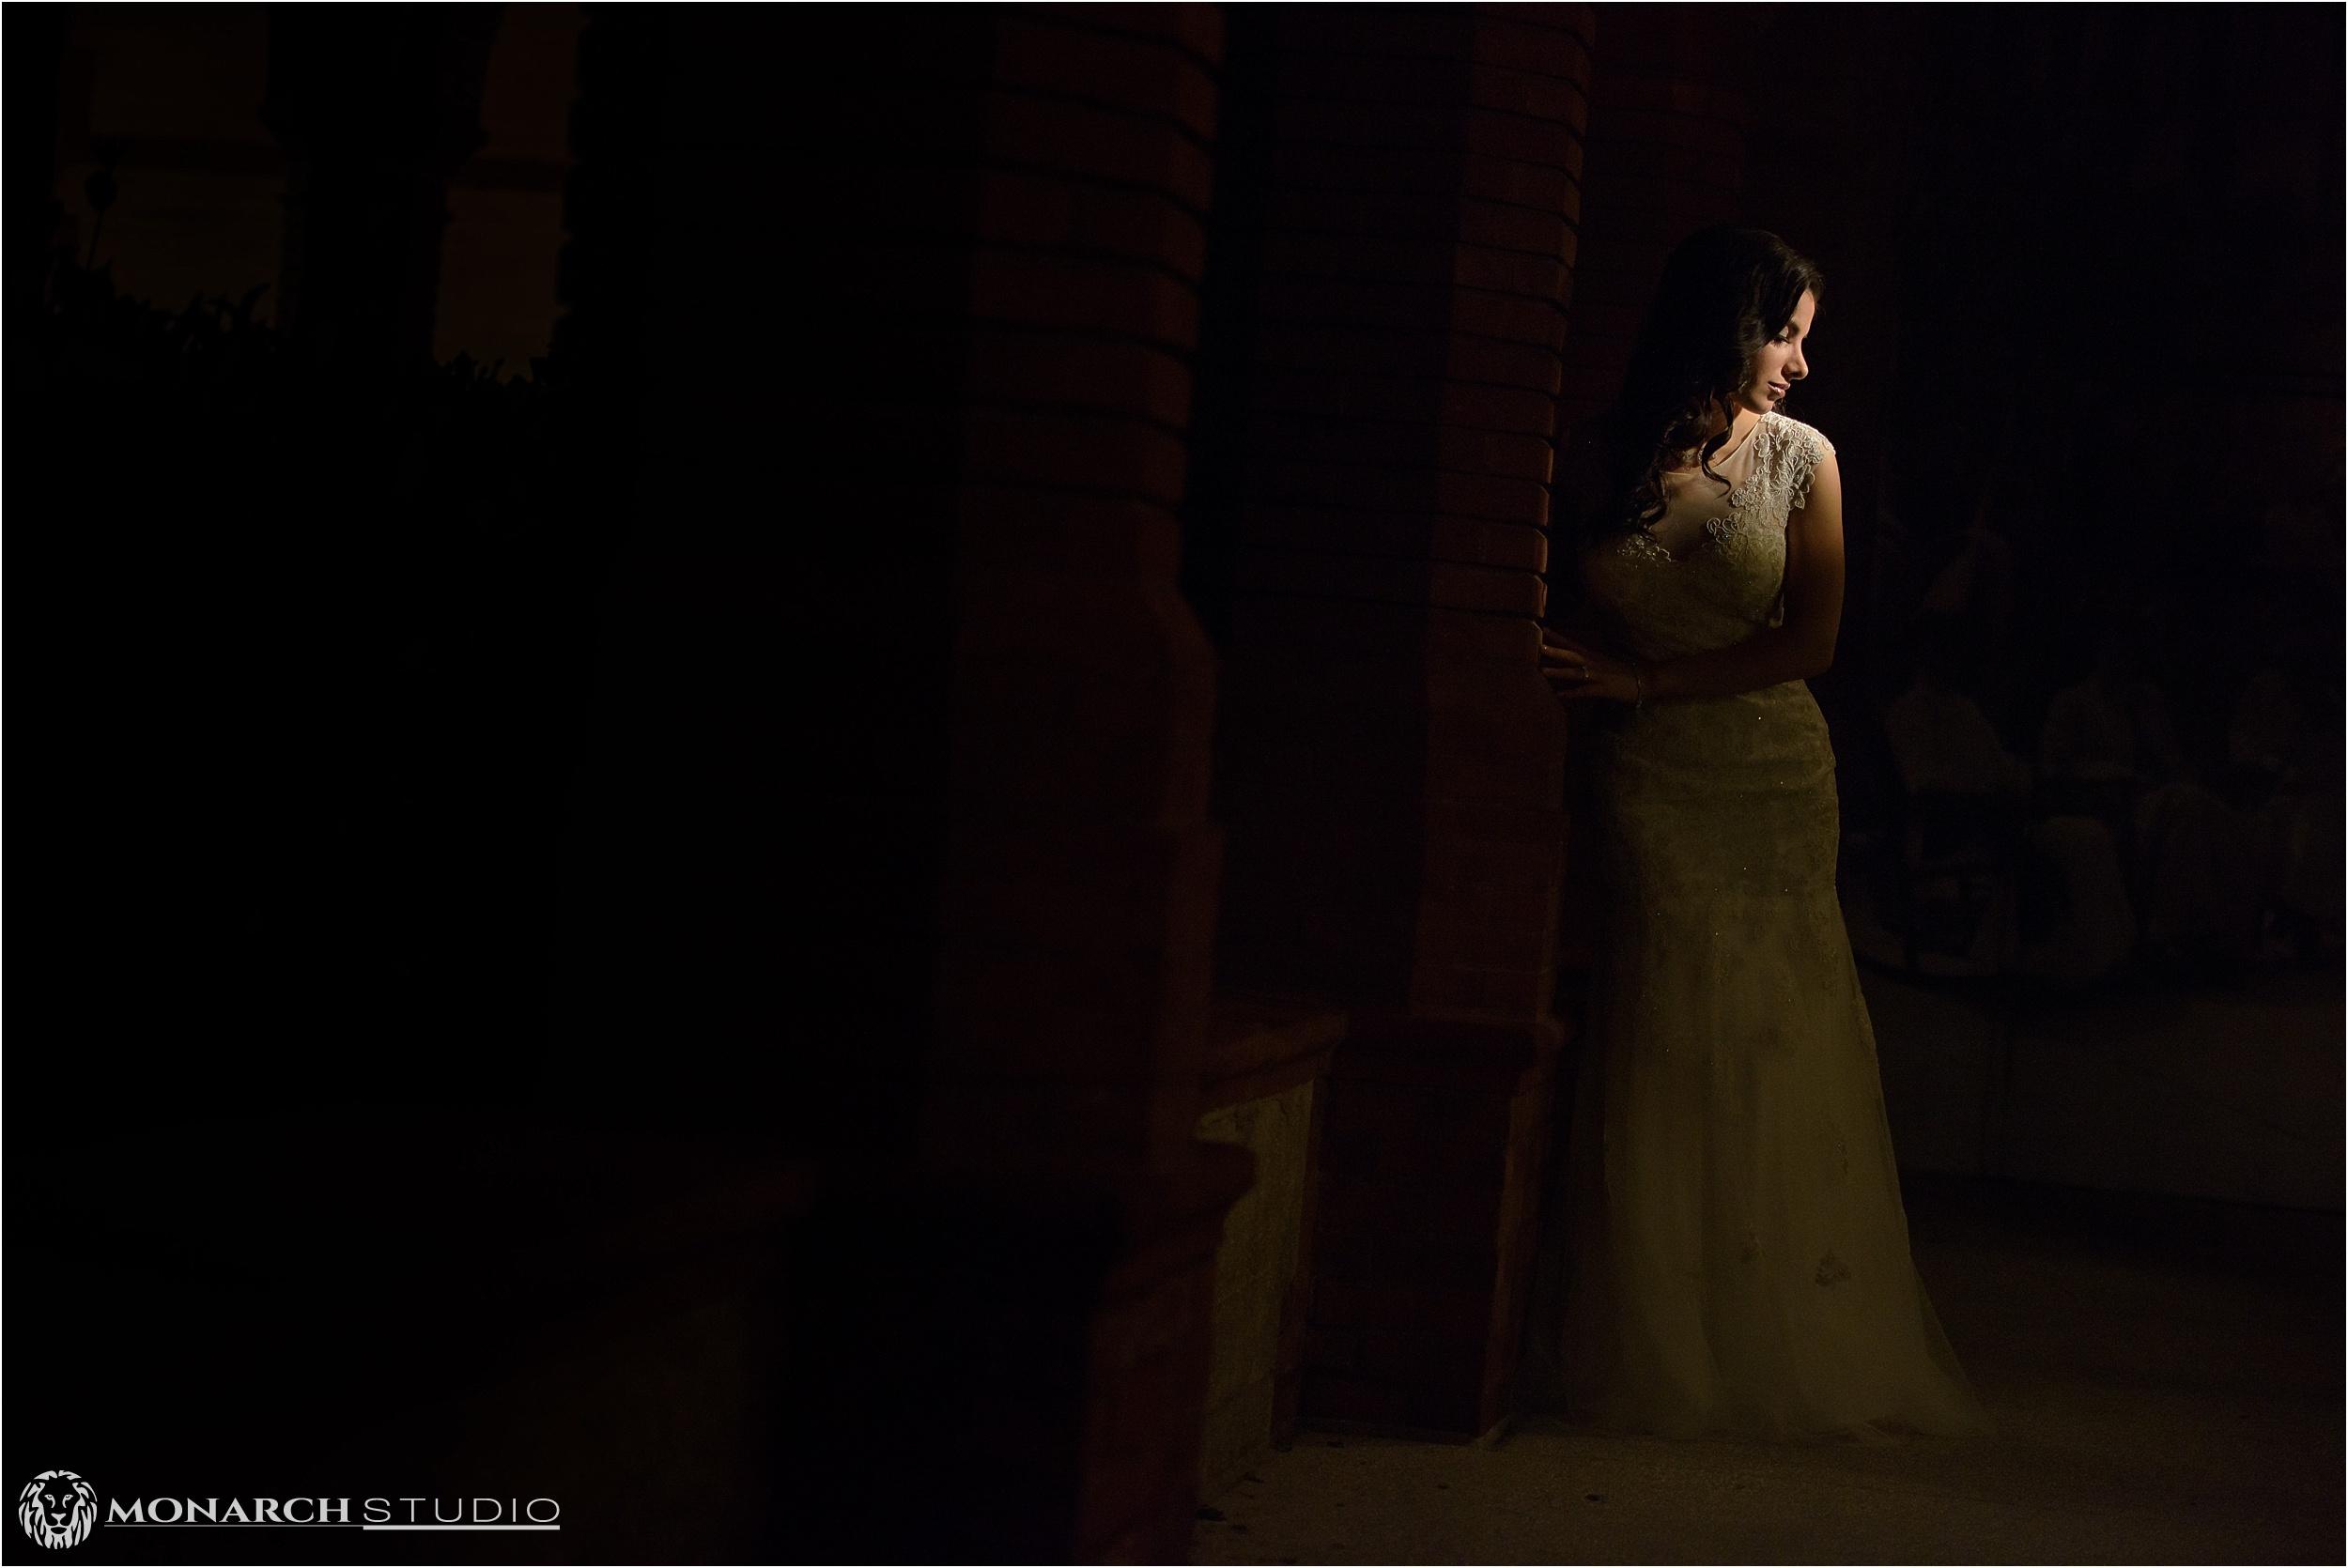 Persian-Aghd-Wedding-Photographer- سفره عقد-071.jpg